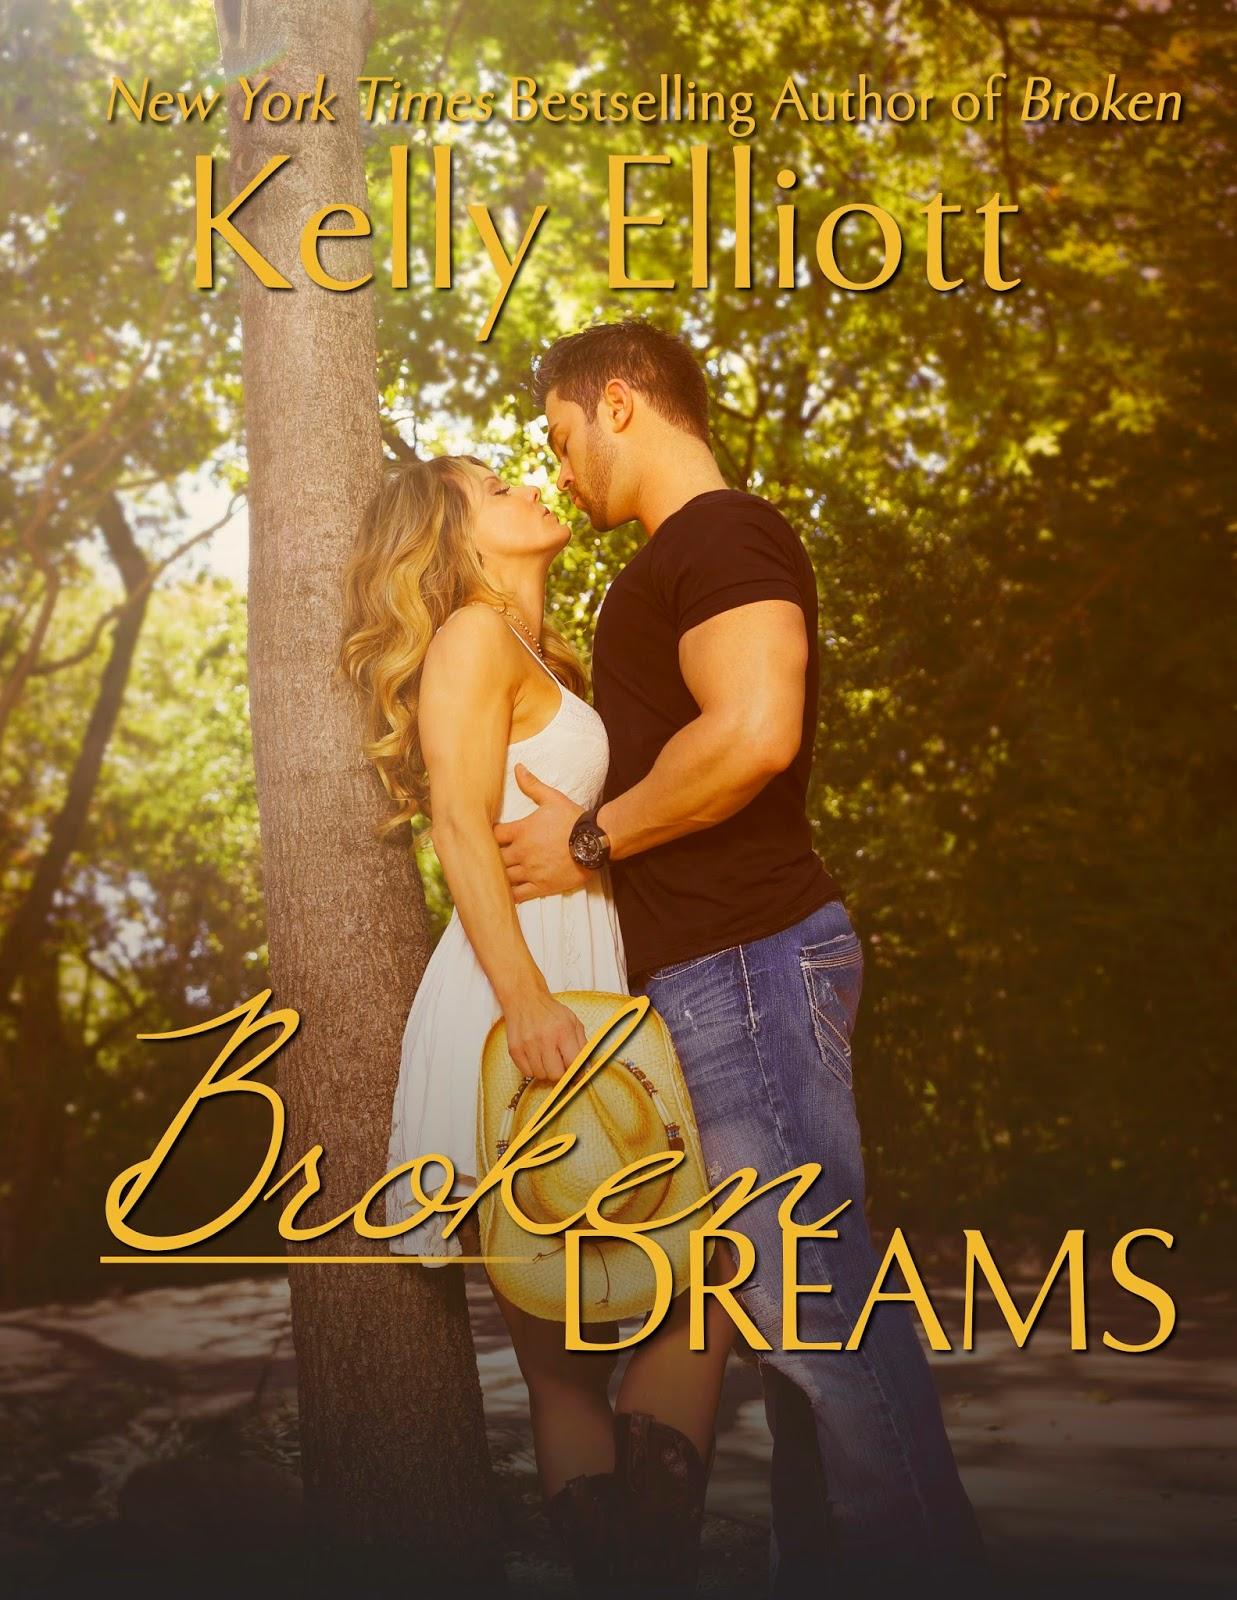 Cover Reveal for Broken Dreams by Kelly Elliott